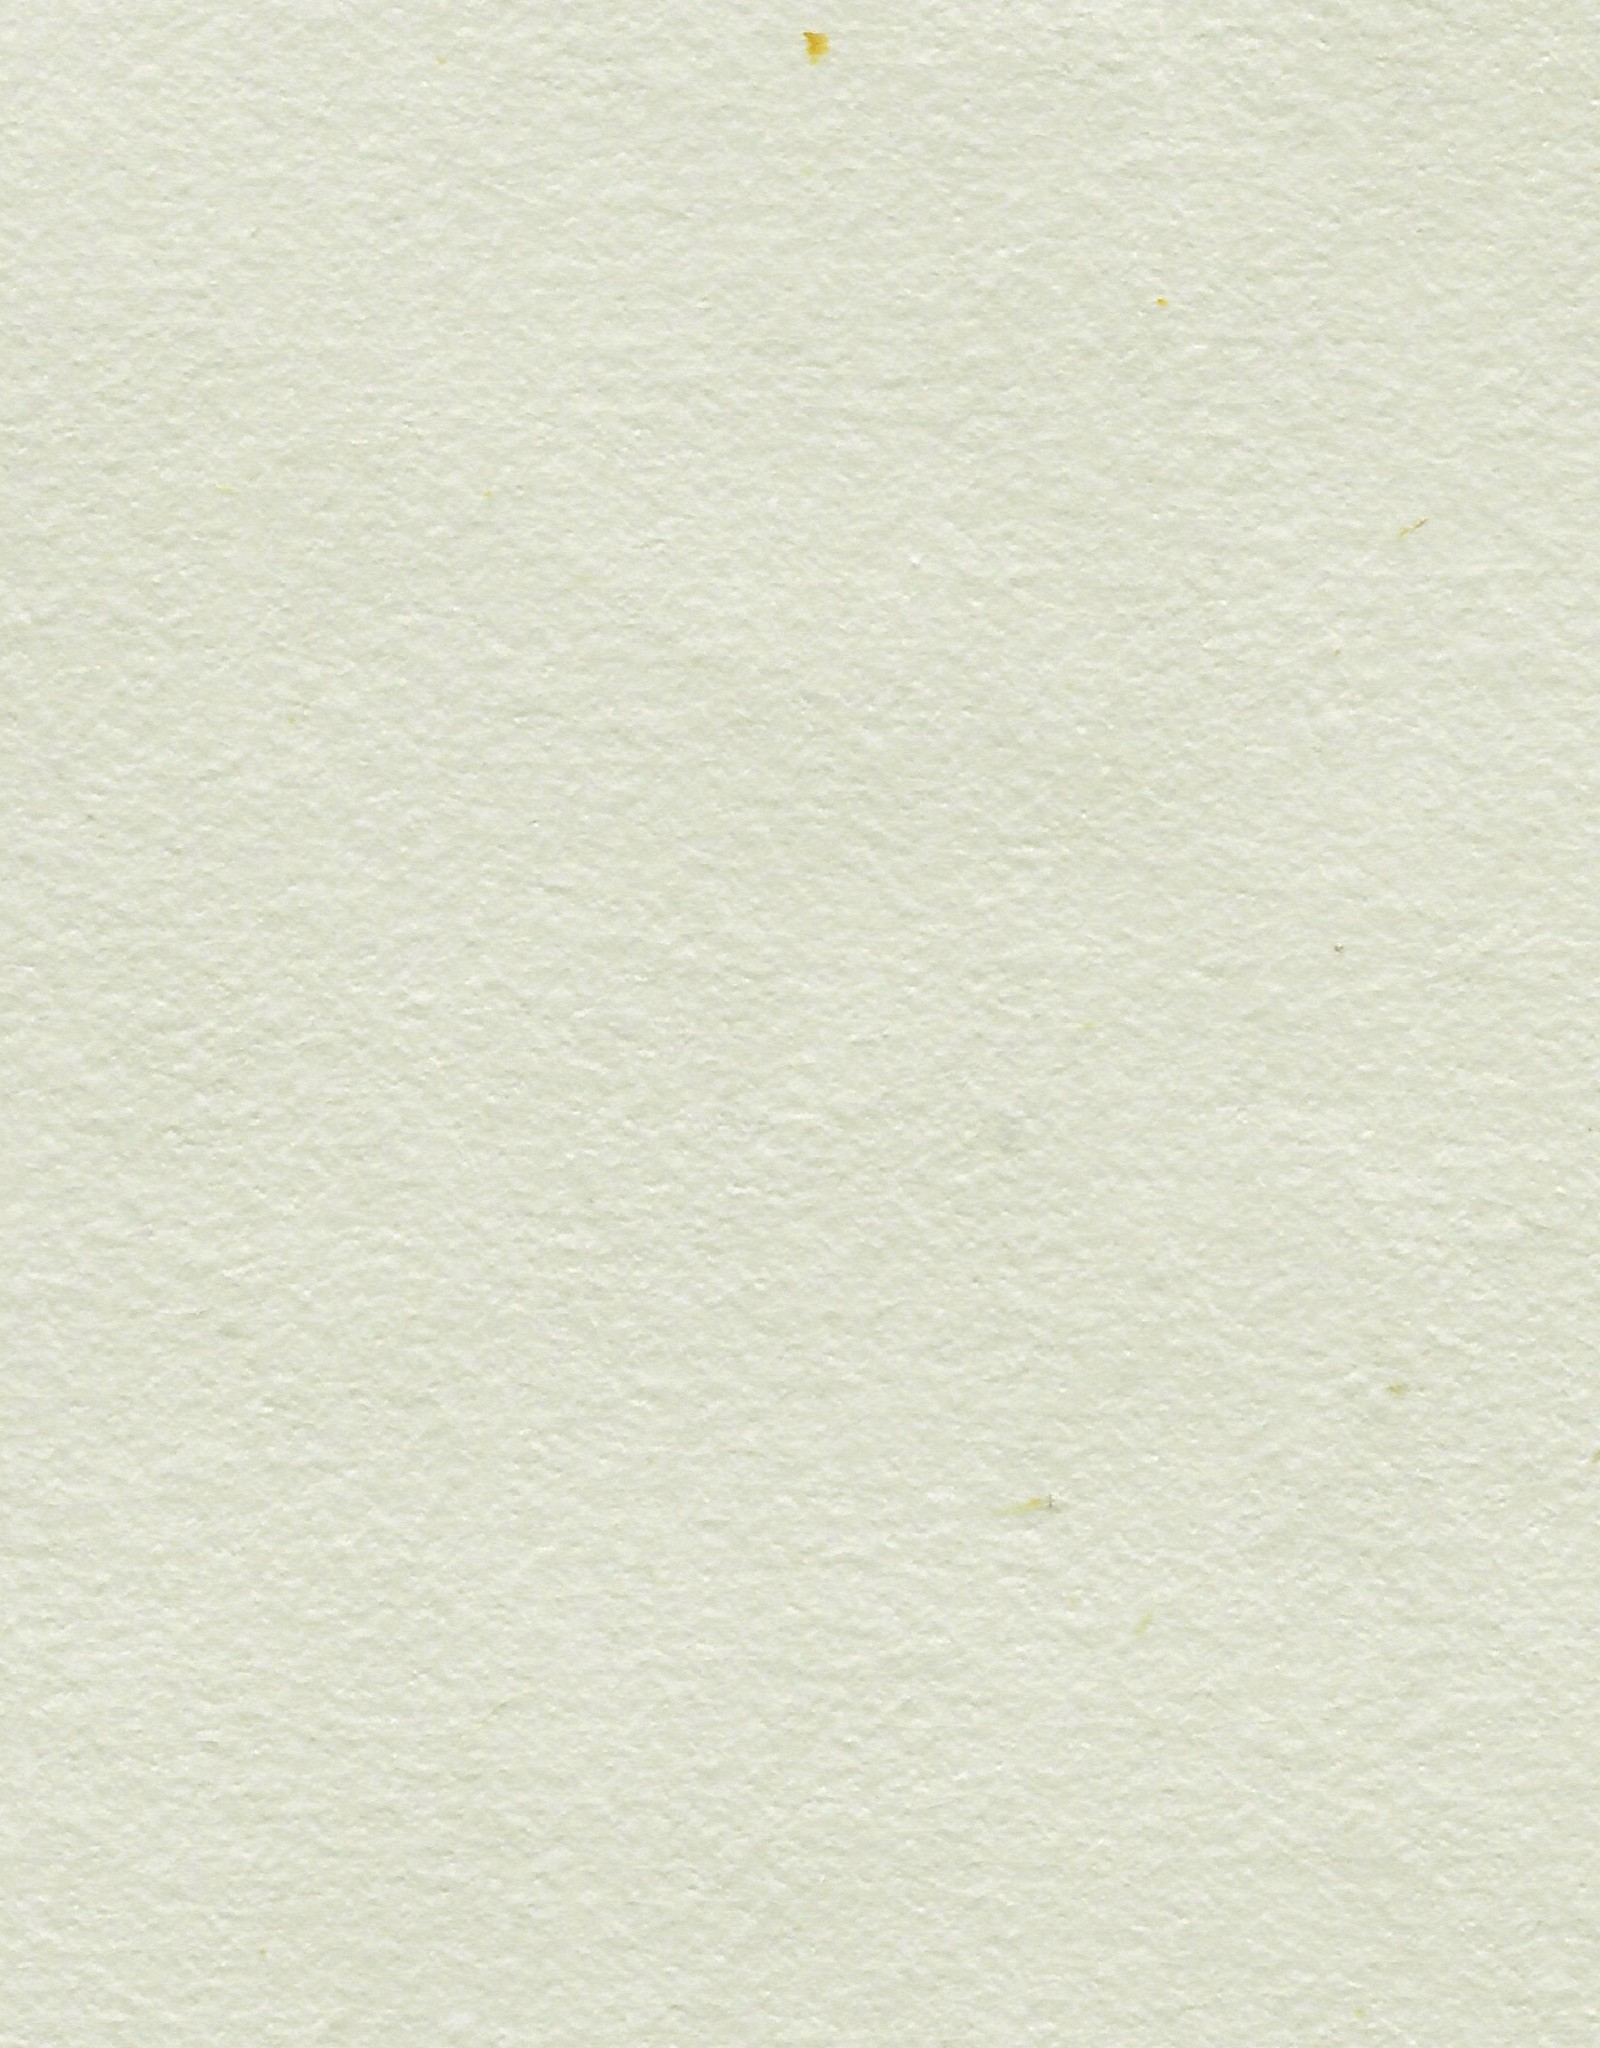 "Japanese Kitakata Pale Green, 16"" x 20"" 30gsm"